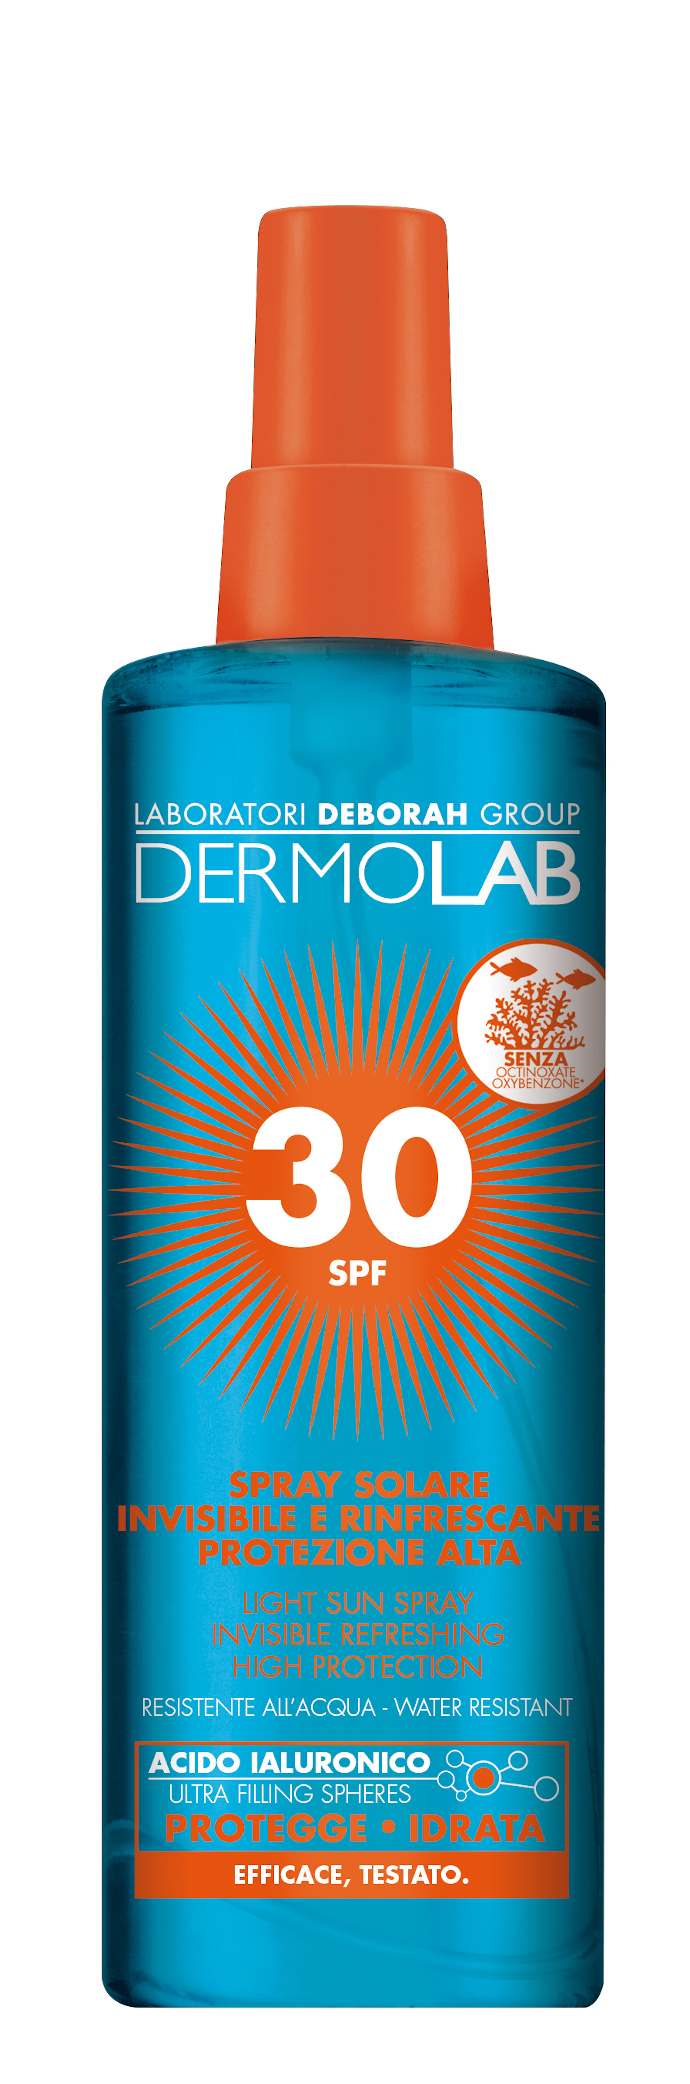 Dermolab Acqua Solare Spray